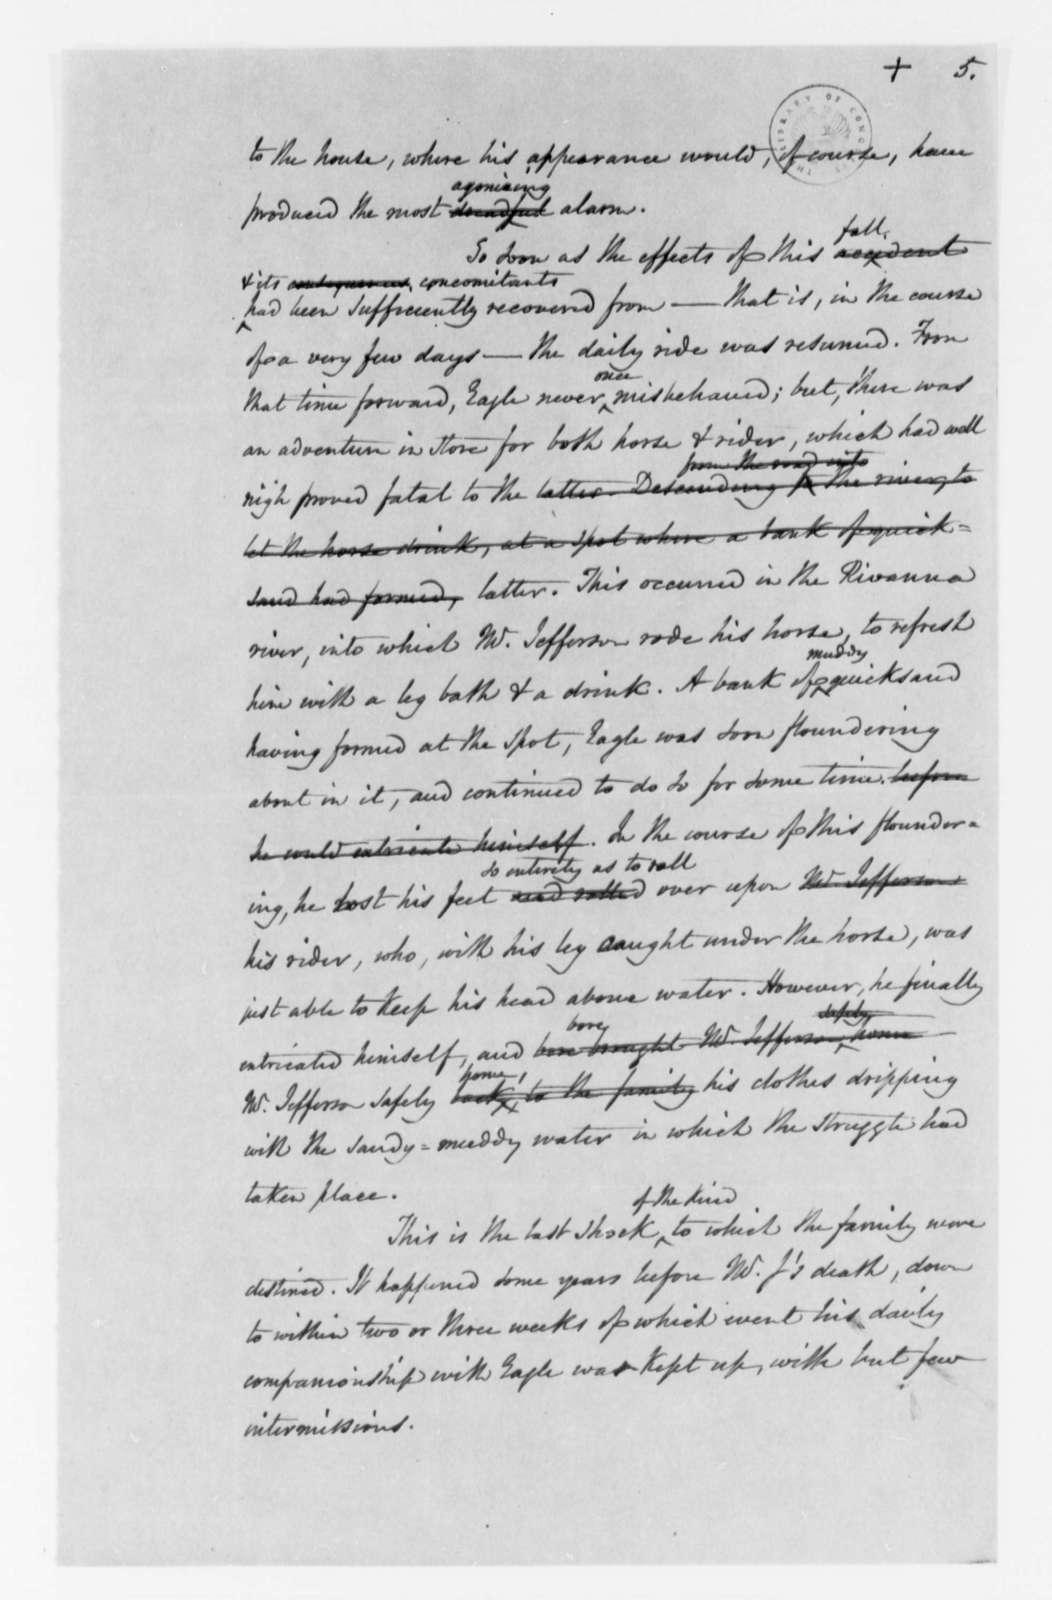 Nicholas P. Trist to Henry S. Randall, no date, Memorandum